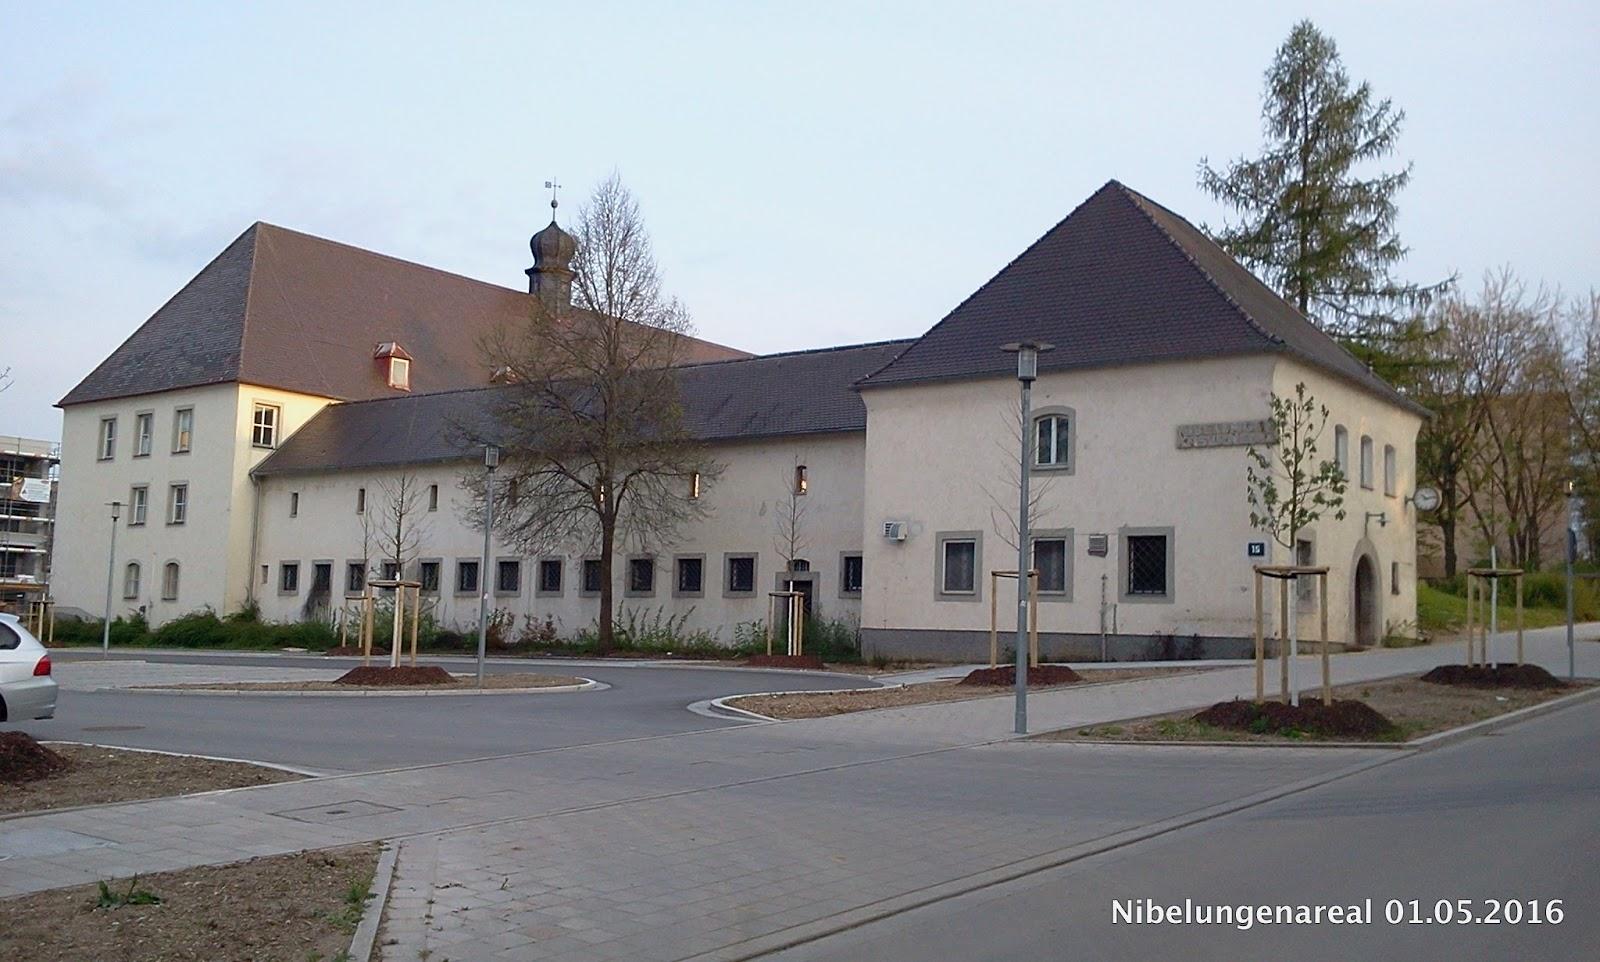 Nibelungenkaserne Regensburg